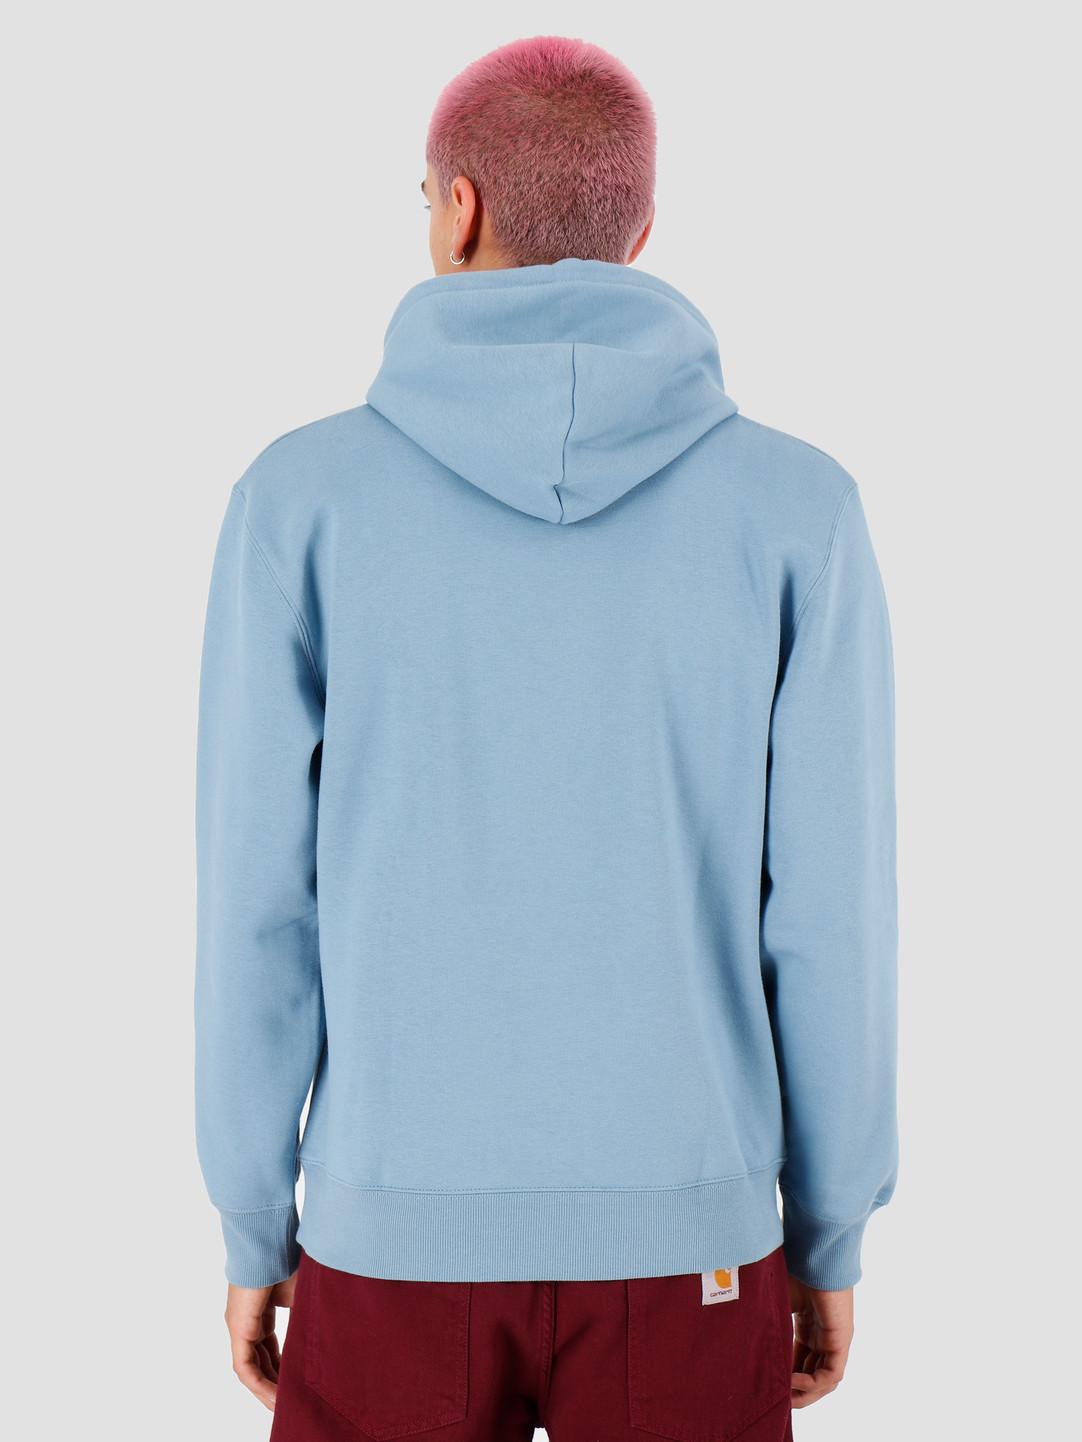 Carhartt WIP Carhartt WIP Hooded Theory Sweat Cold Blue I027031